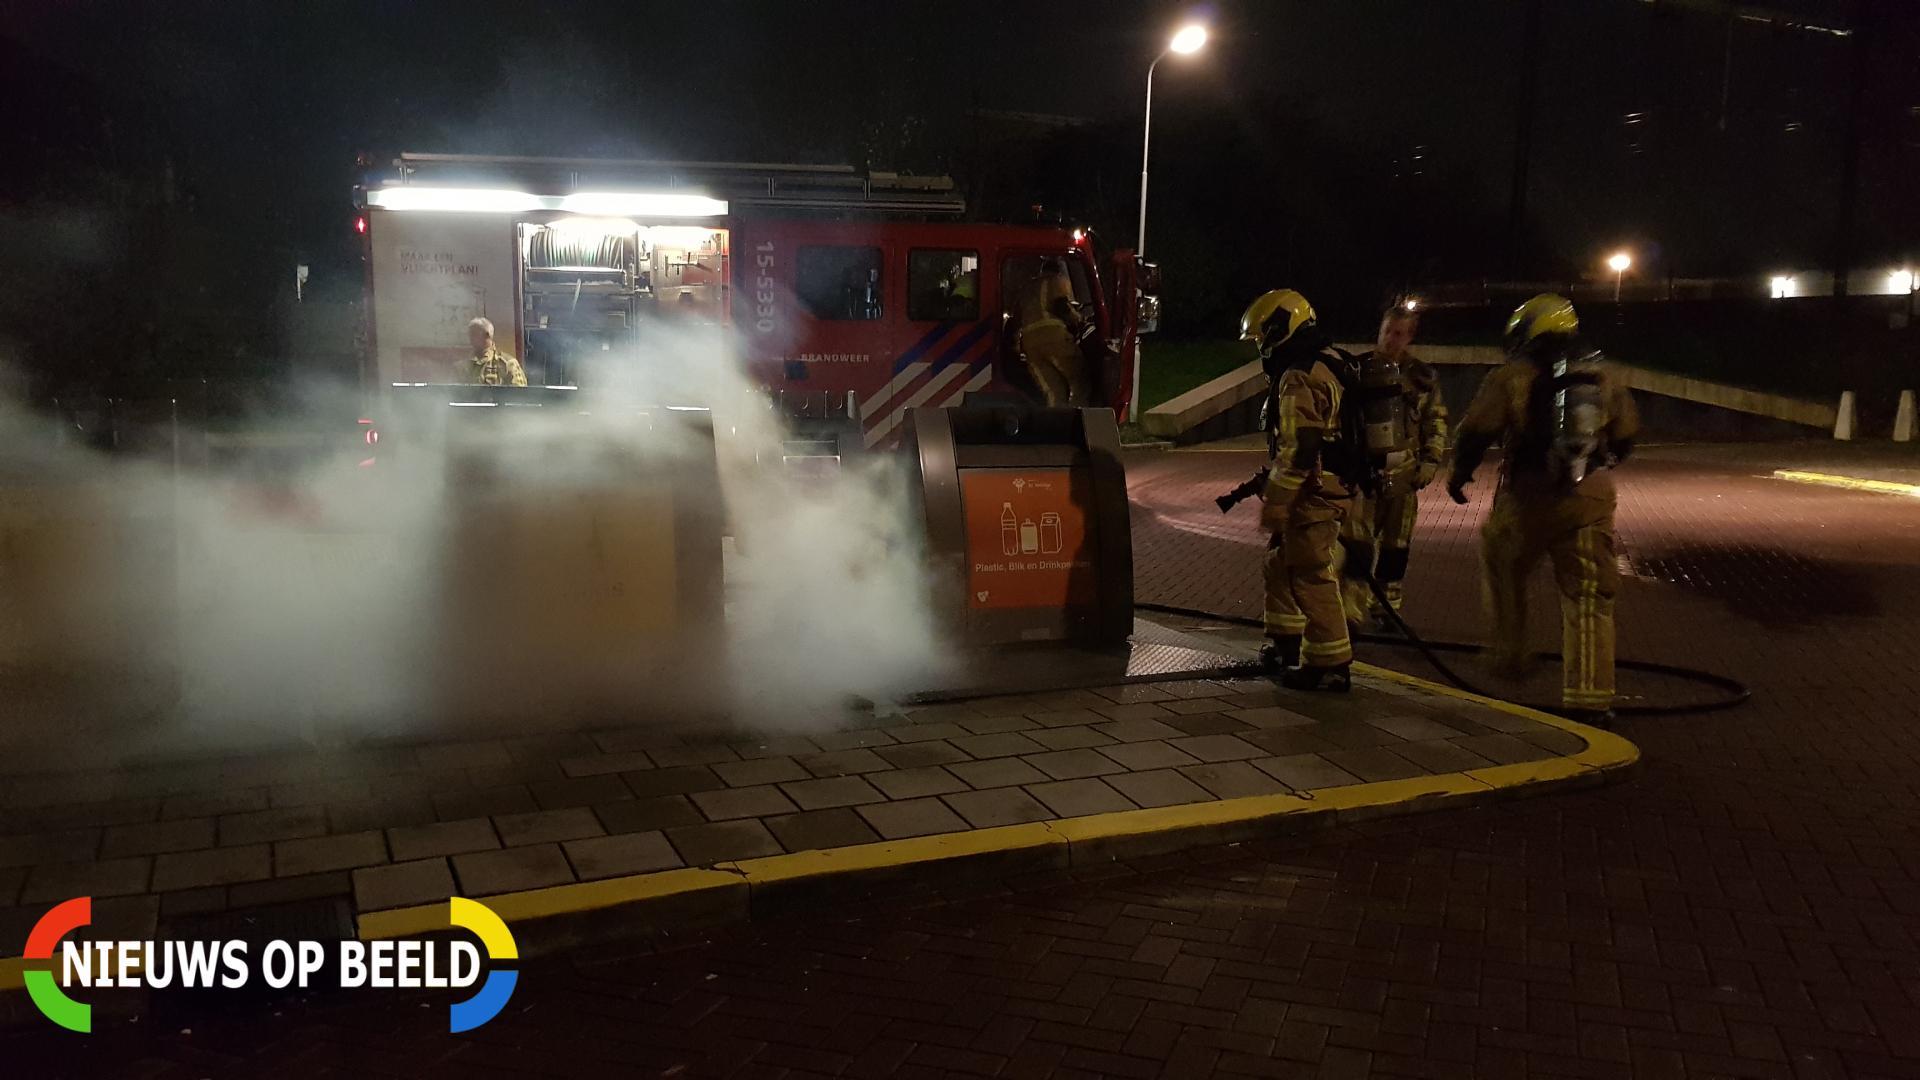 Brandweer druk met containerbrand Petuniatuin Zoetermeer